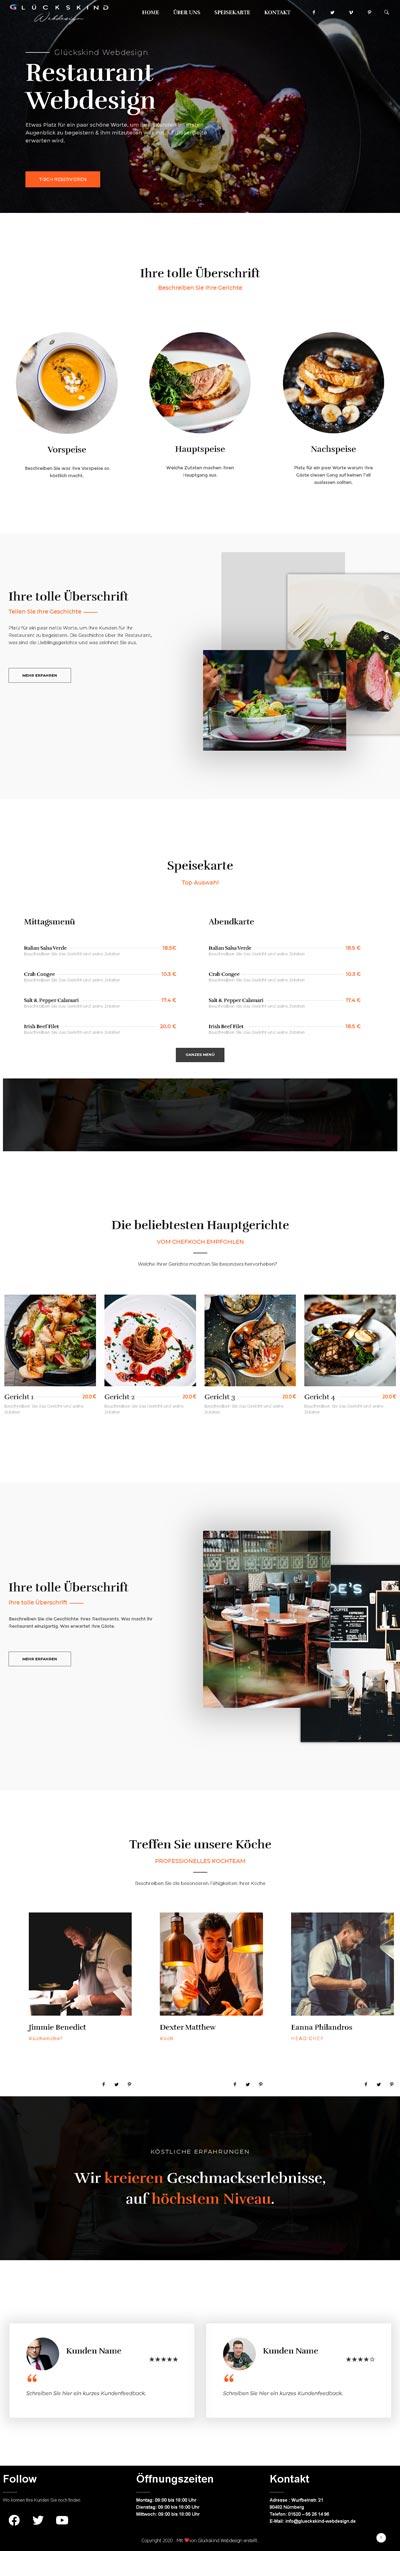 Restaurant Millau - Glückskind Webdesign Musterkatalog